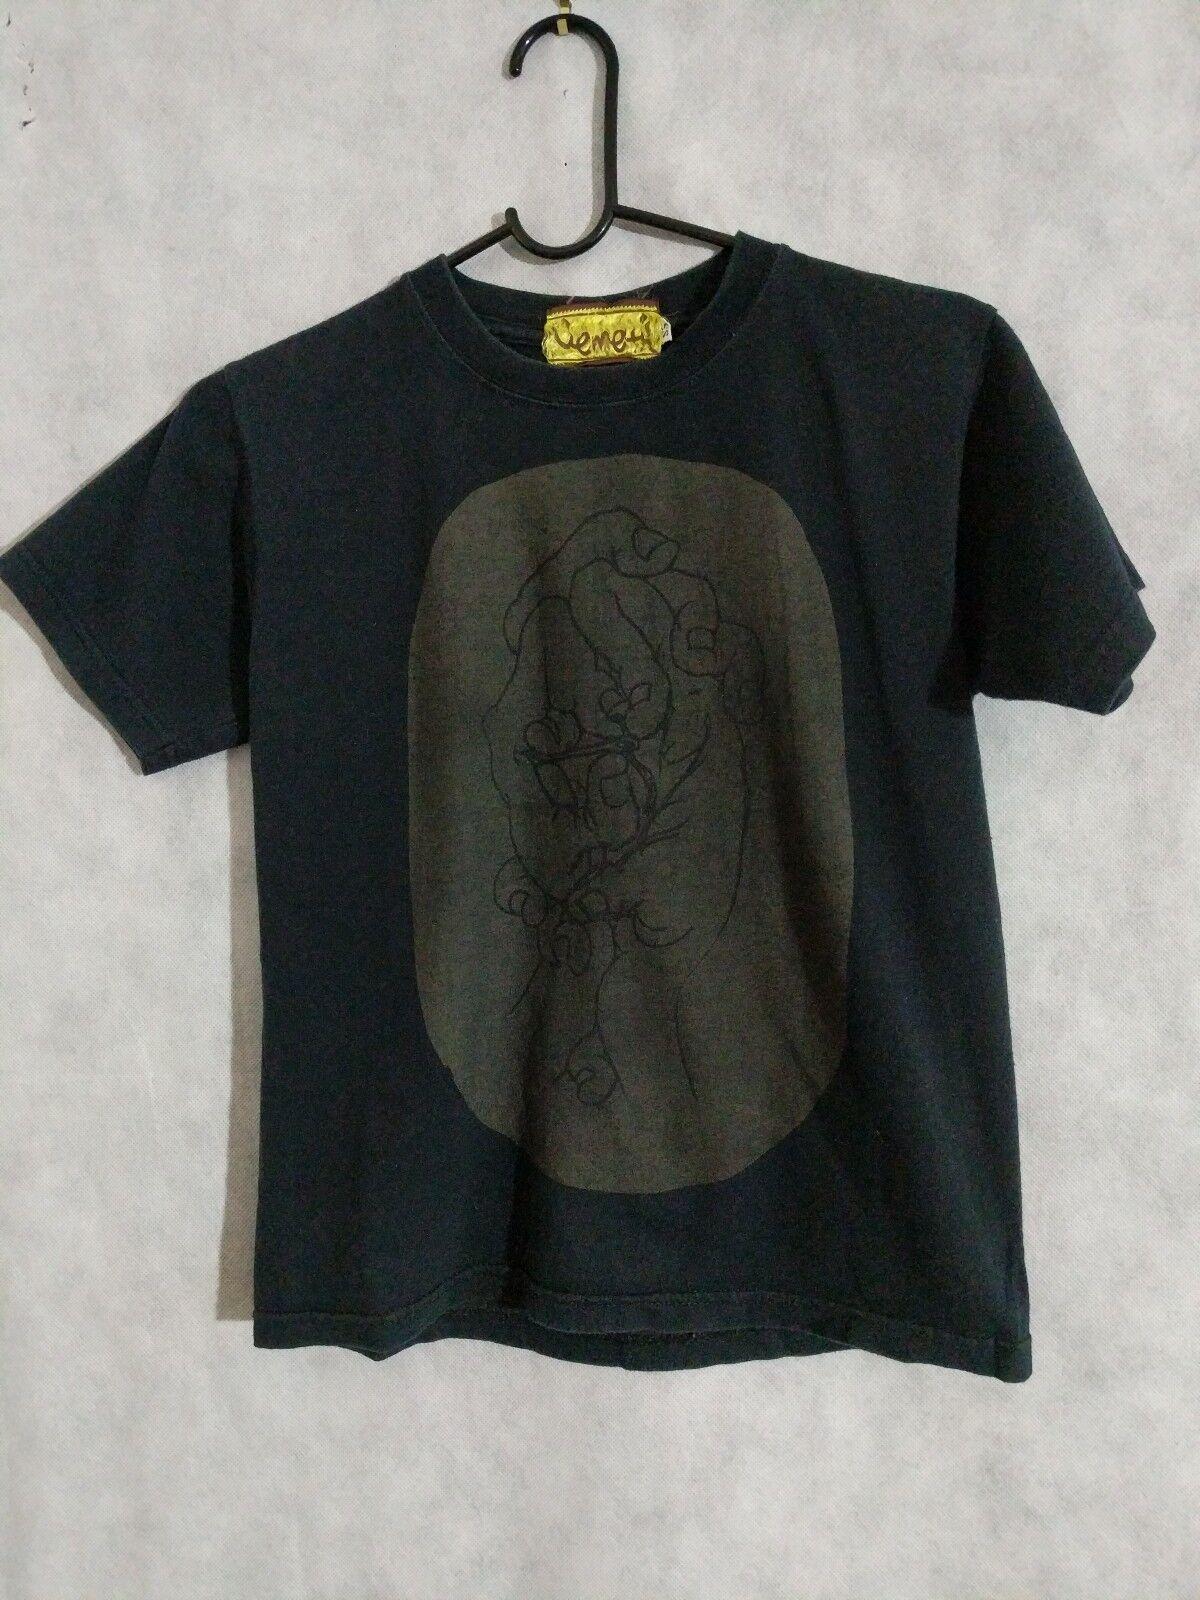 Christopher NEMETH Vintage Graphic T Shirt SS